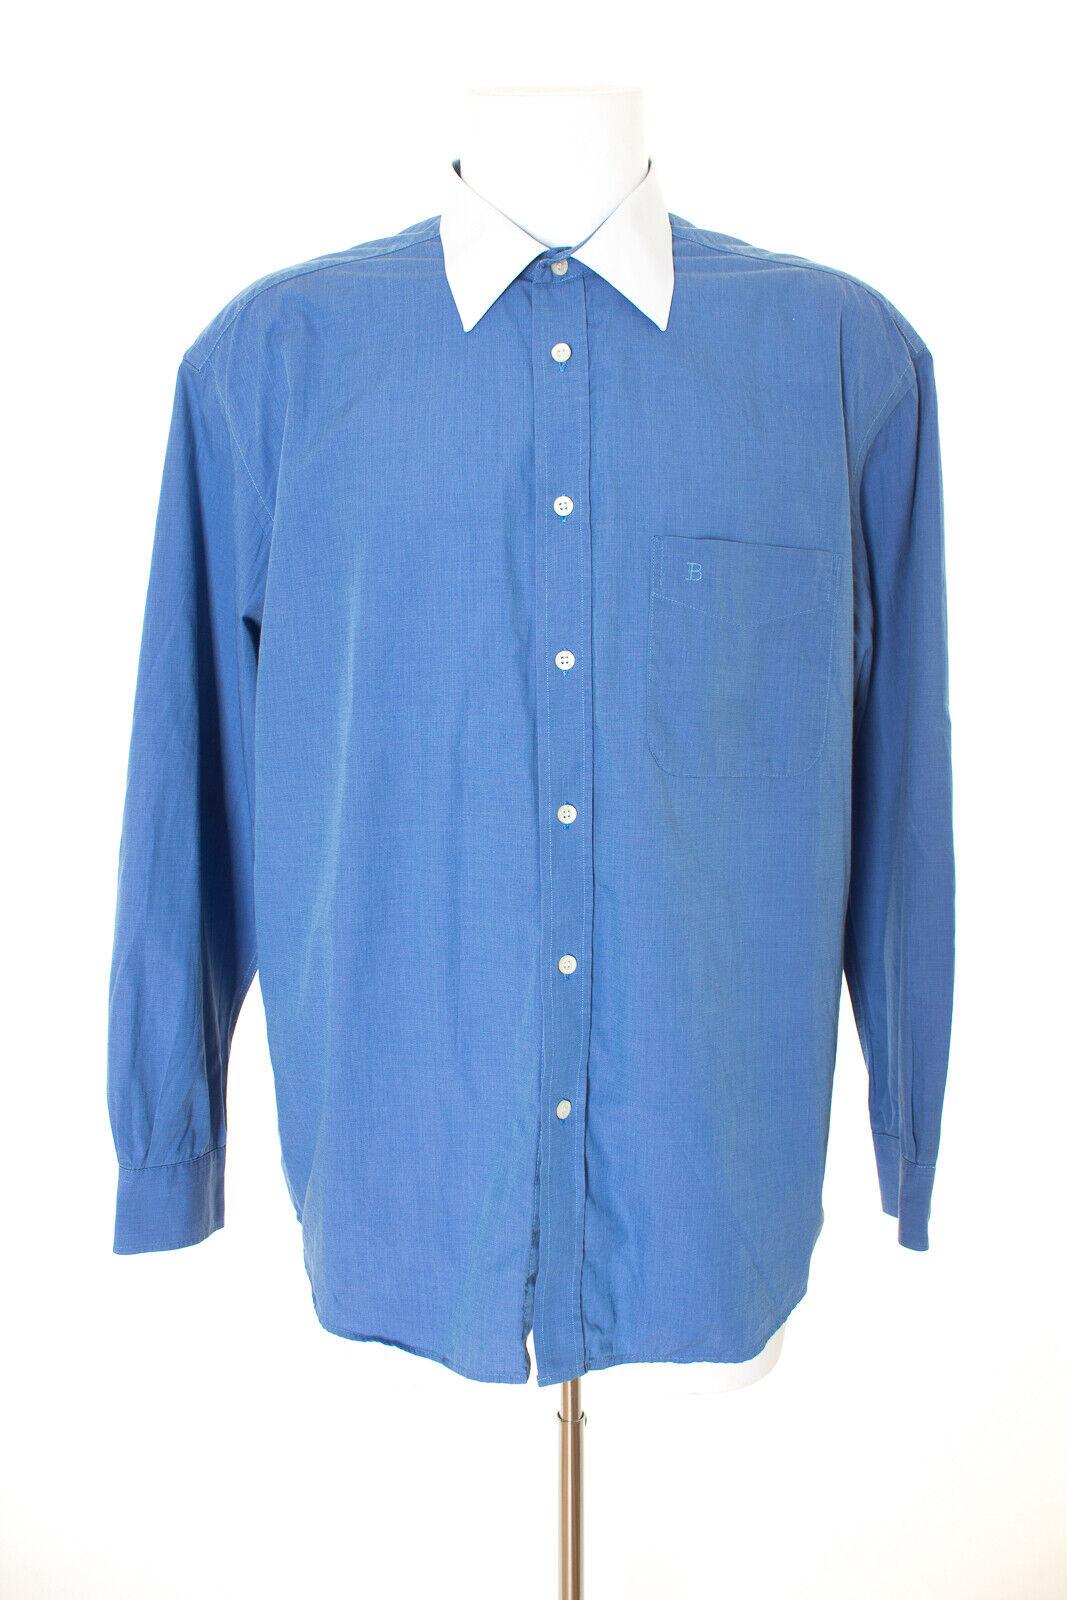 BALMAIN Camicia Classica Cotone Uomo Tg. 44 5 in blu bianco